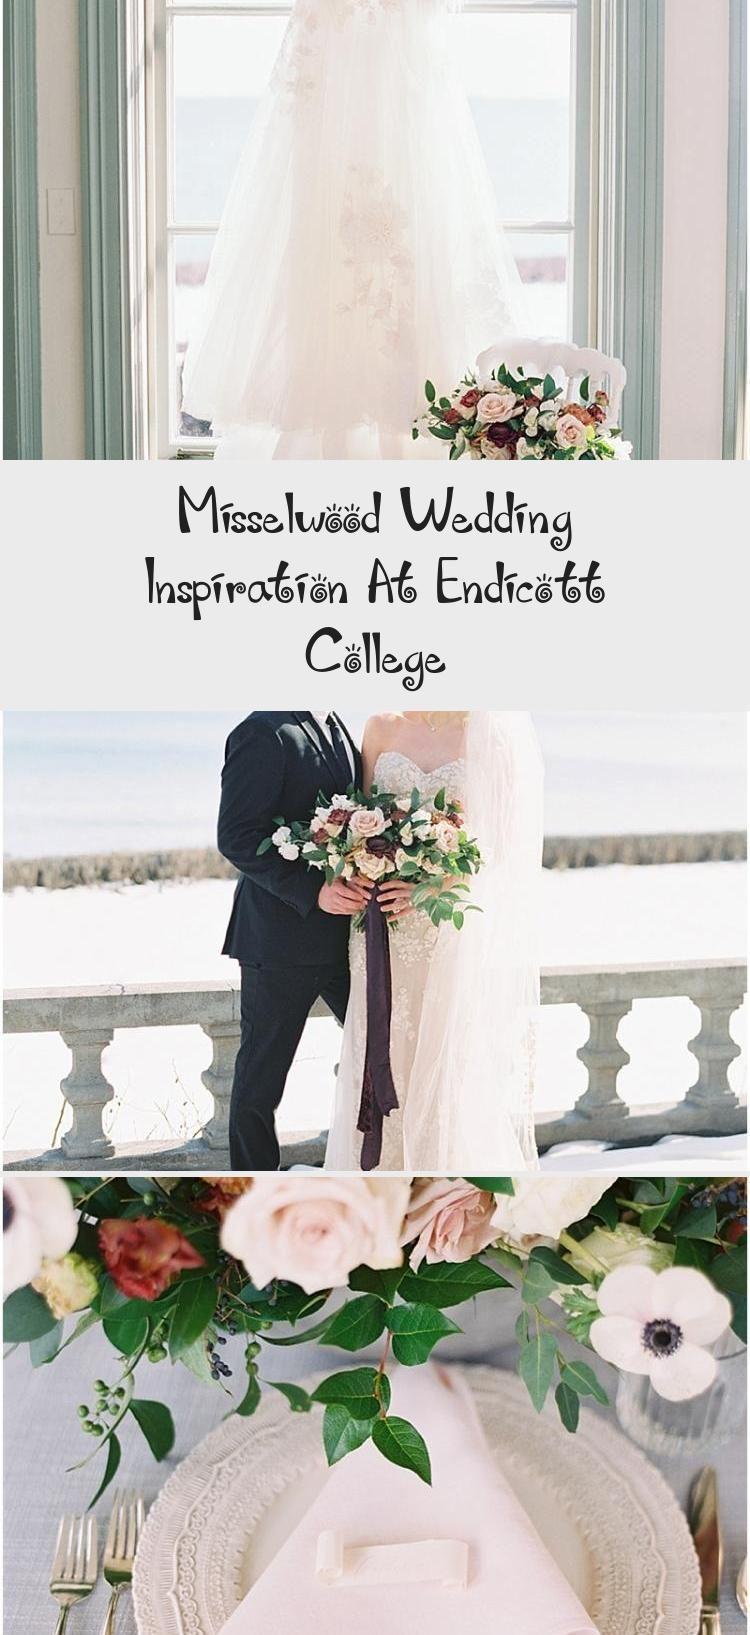 Misselwood Wedding Inspiration At Endicott College Yasmin S Blog In 2020 Misselwood Weddings Wedding Film Wedding Photographer